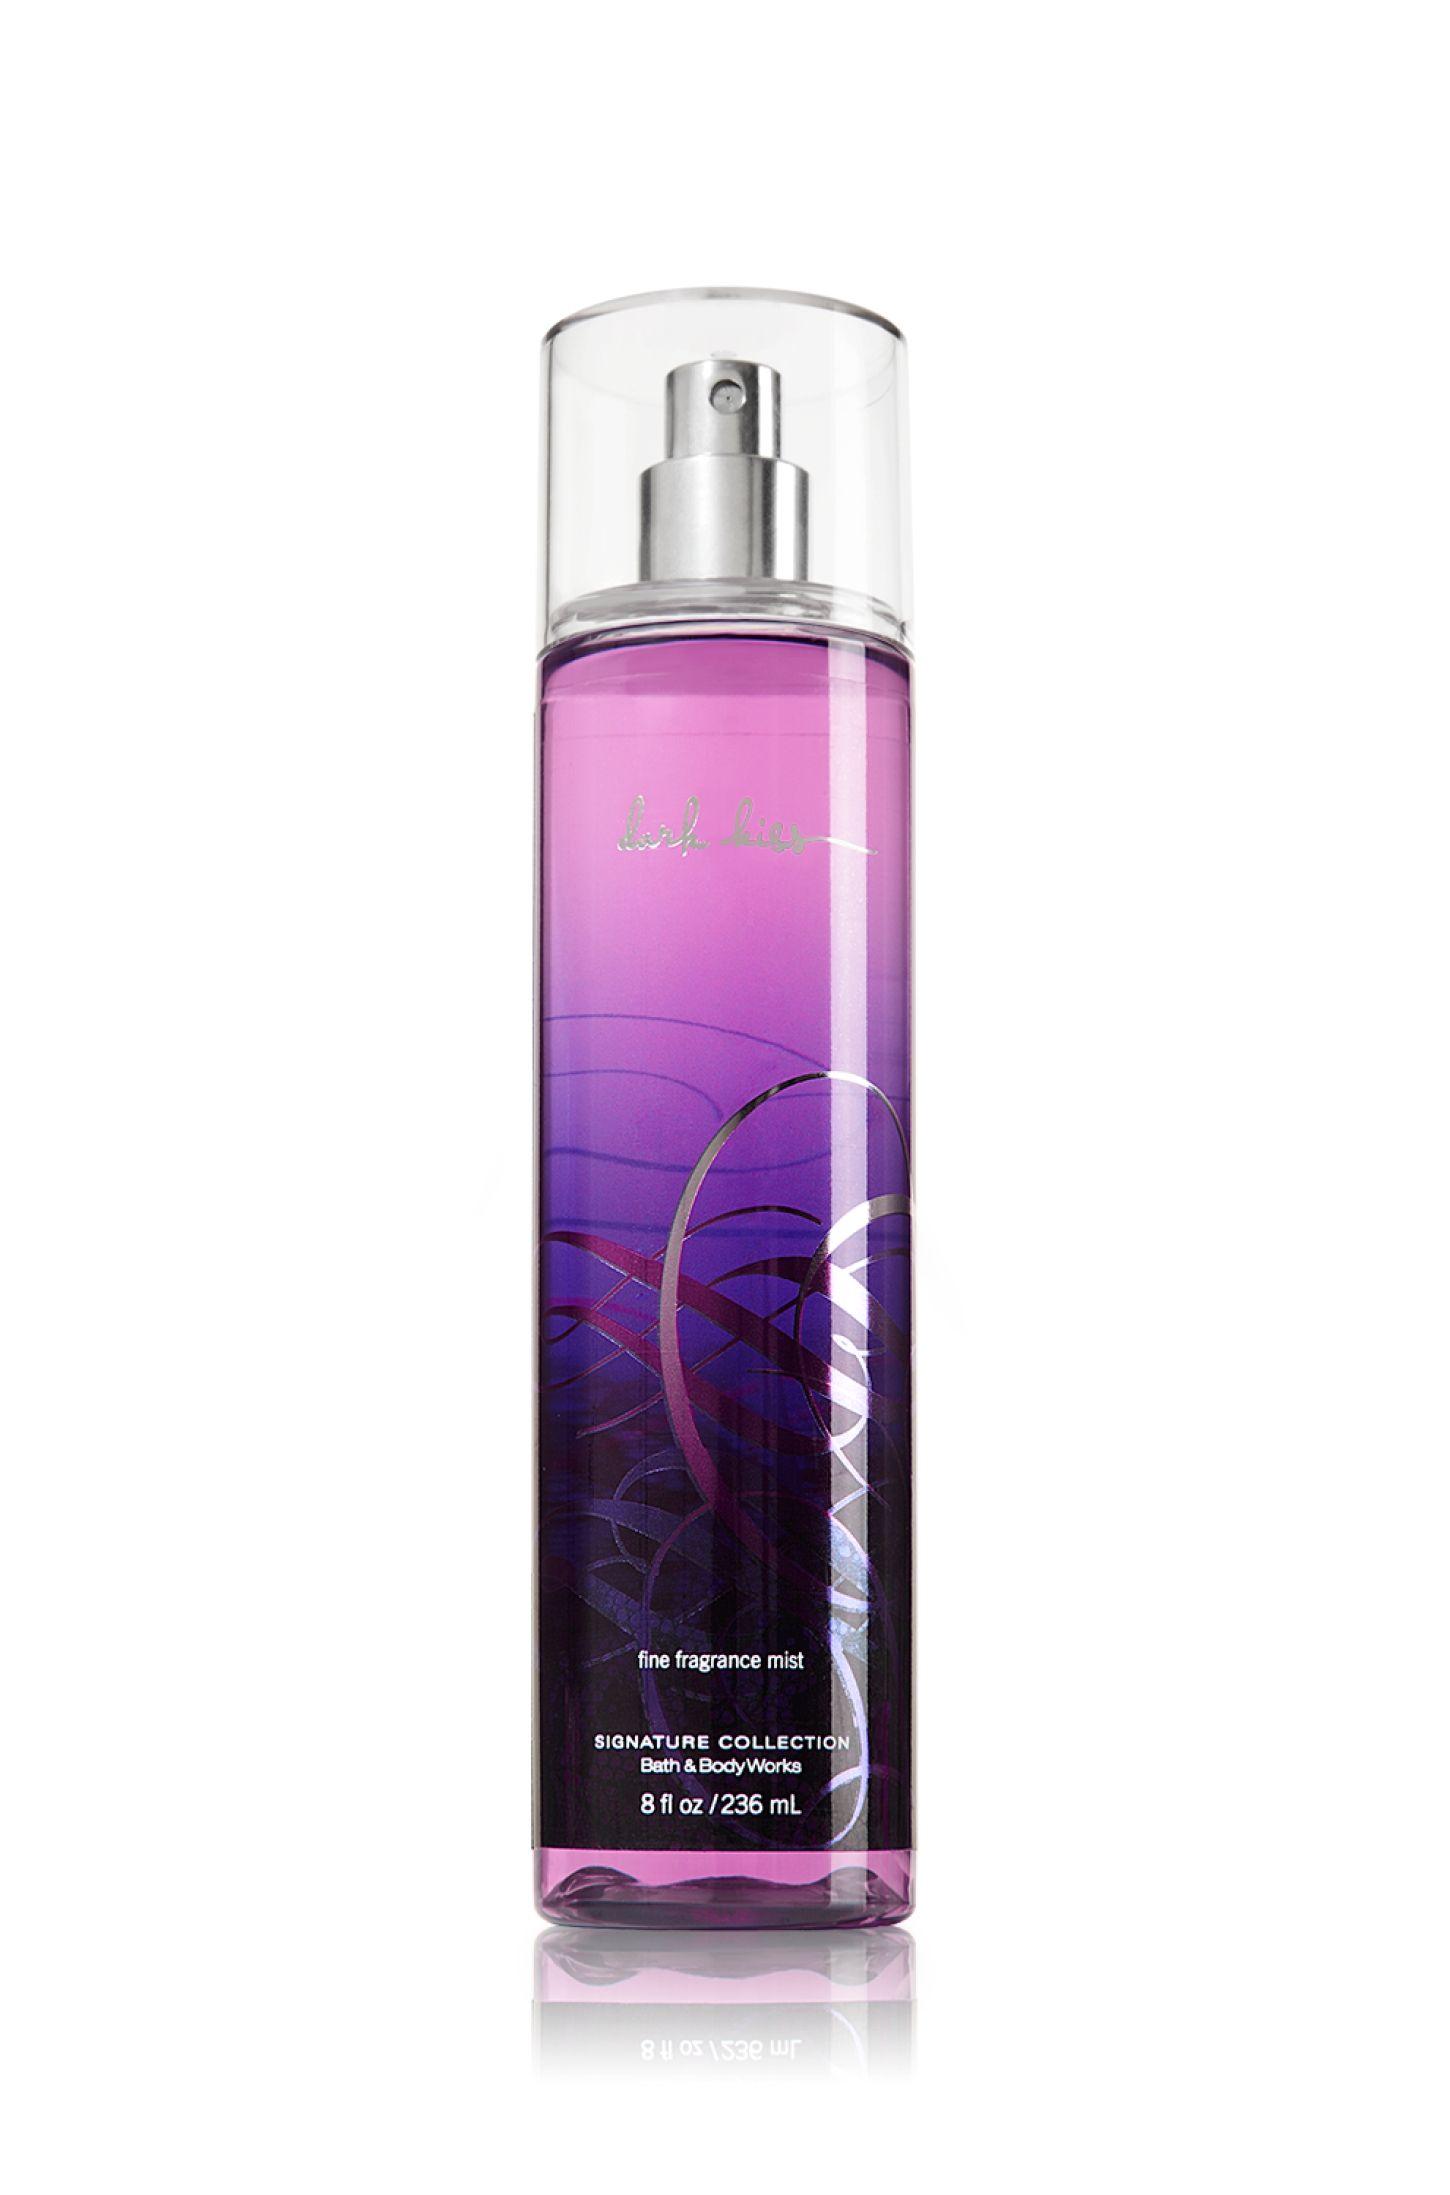 bath and body works perfume - Google Search   Perfume glory   Pinterest